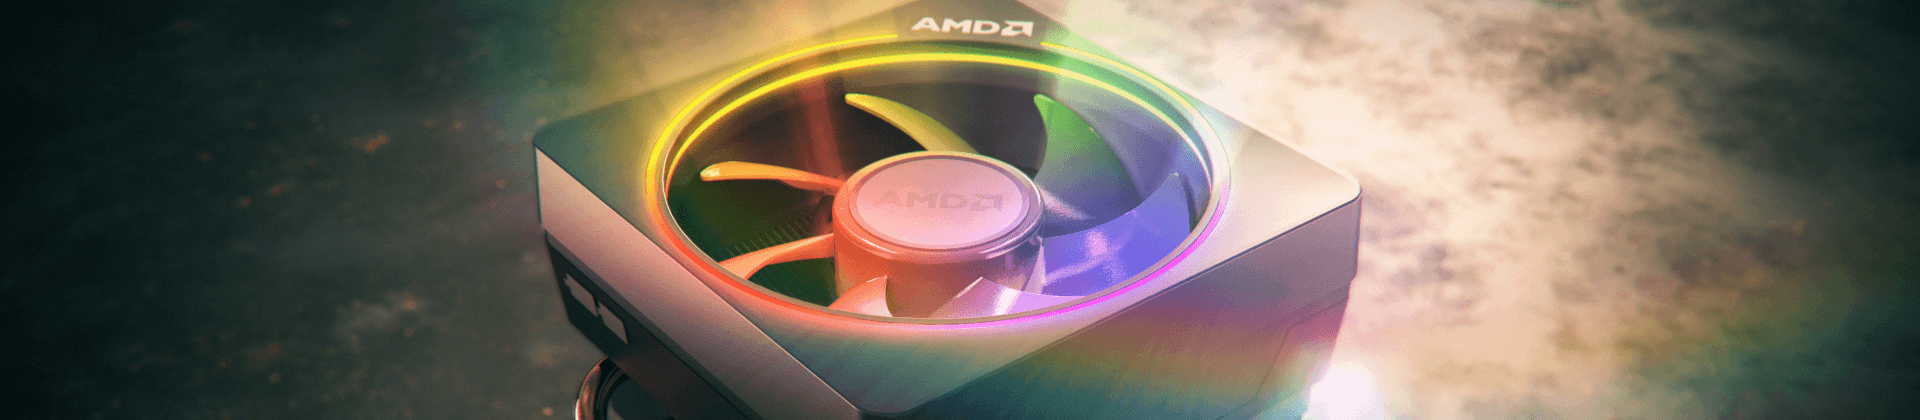 AMD Ryzen 9 3900X AM4 CPU/ Processor with Wraith Prism RGB